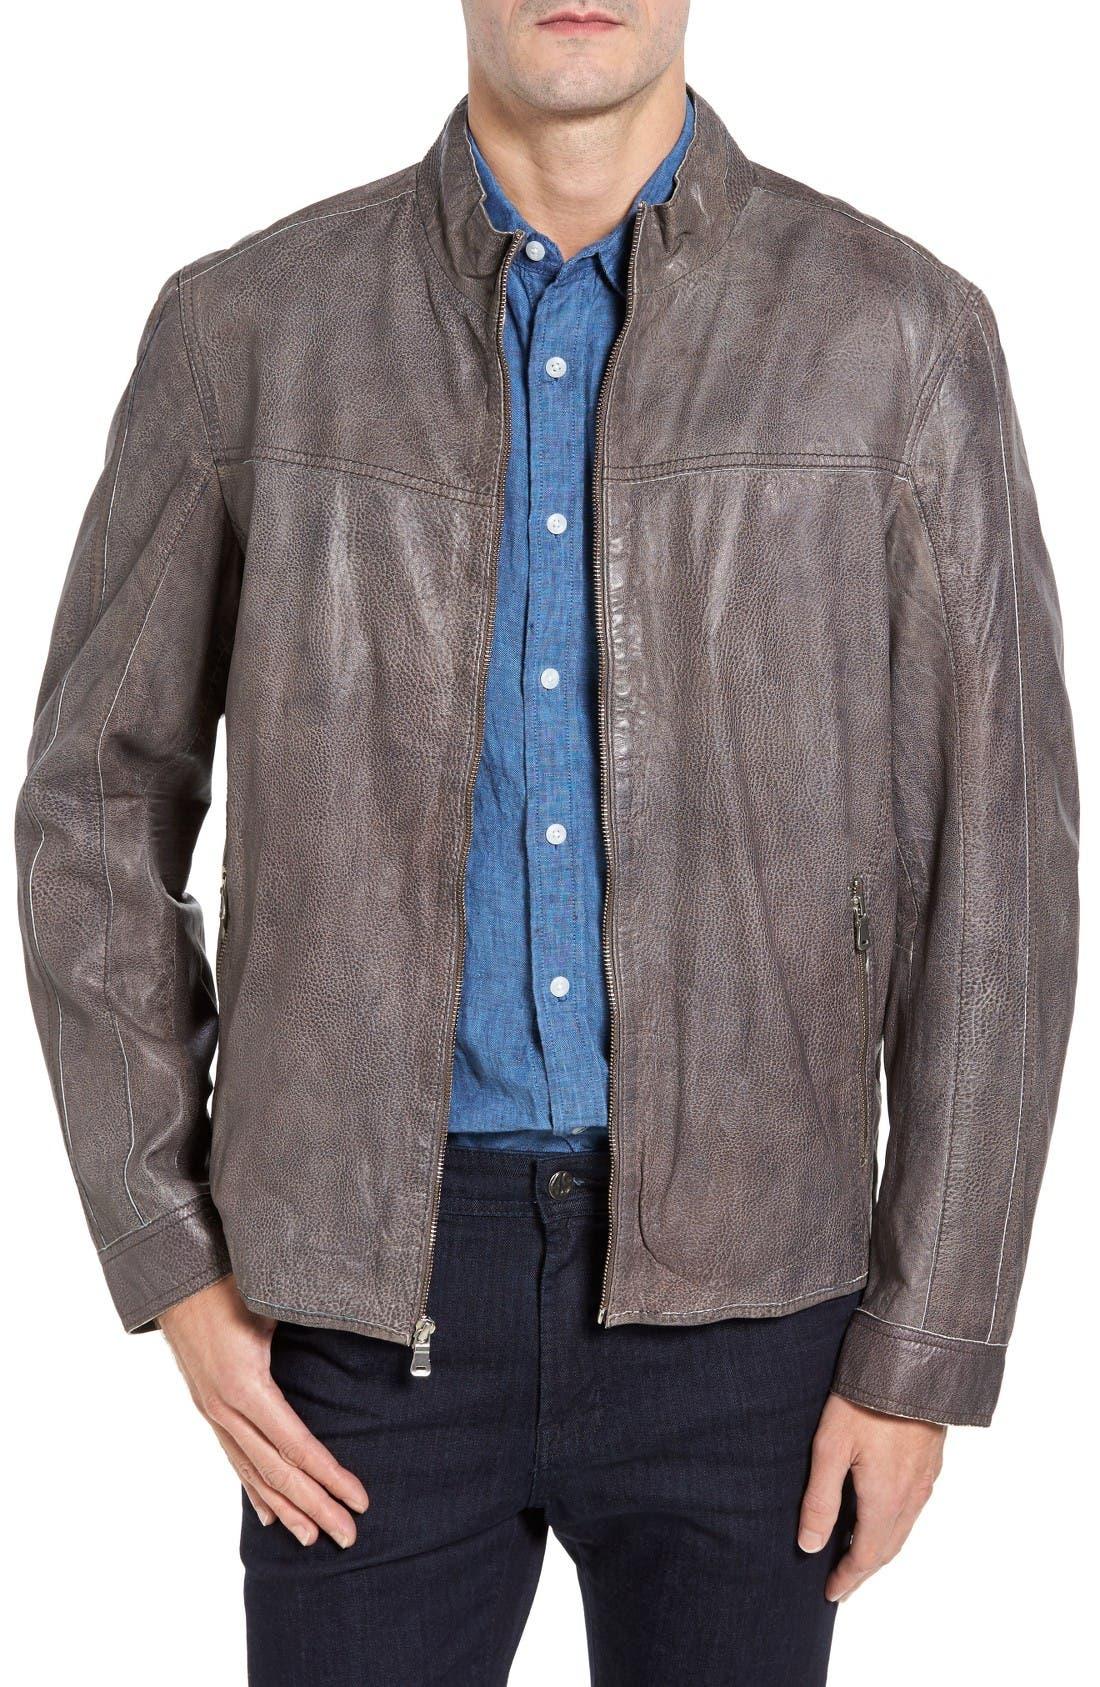 Alternate Image 1 Selected - Missani le Collezioni Lambskin Leather Jacket